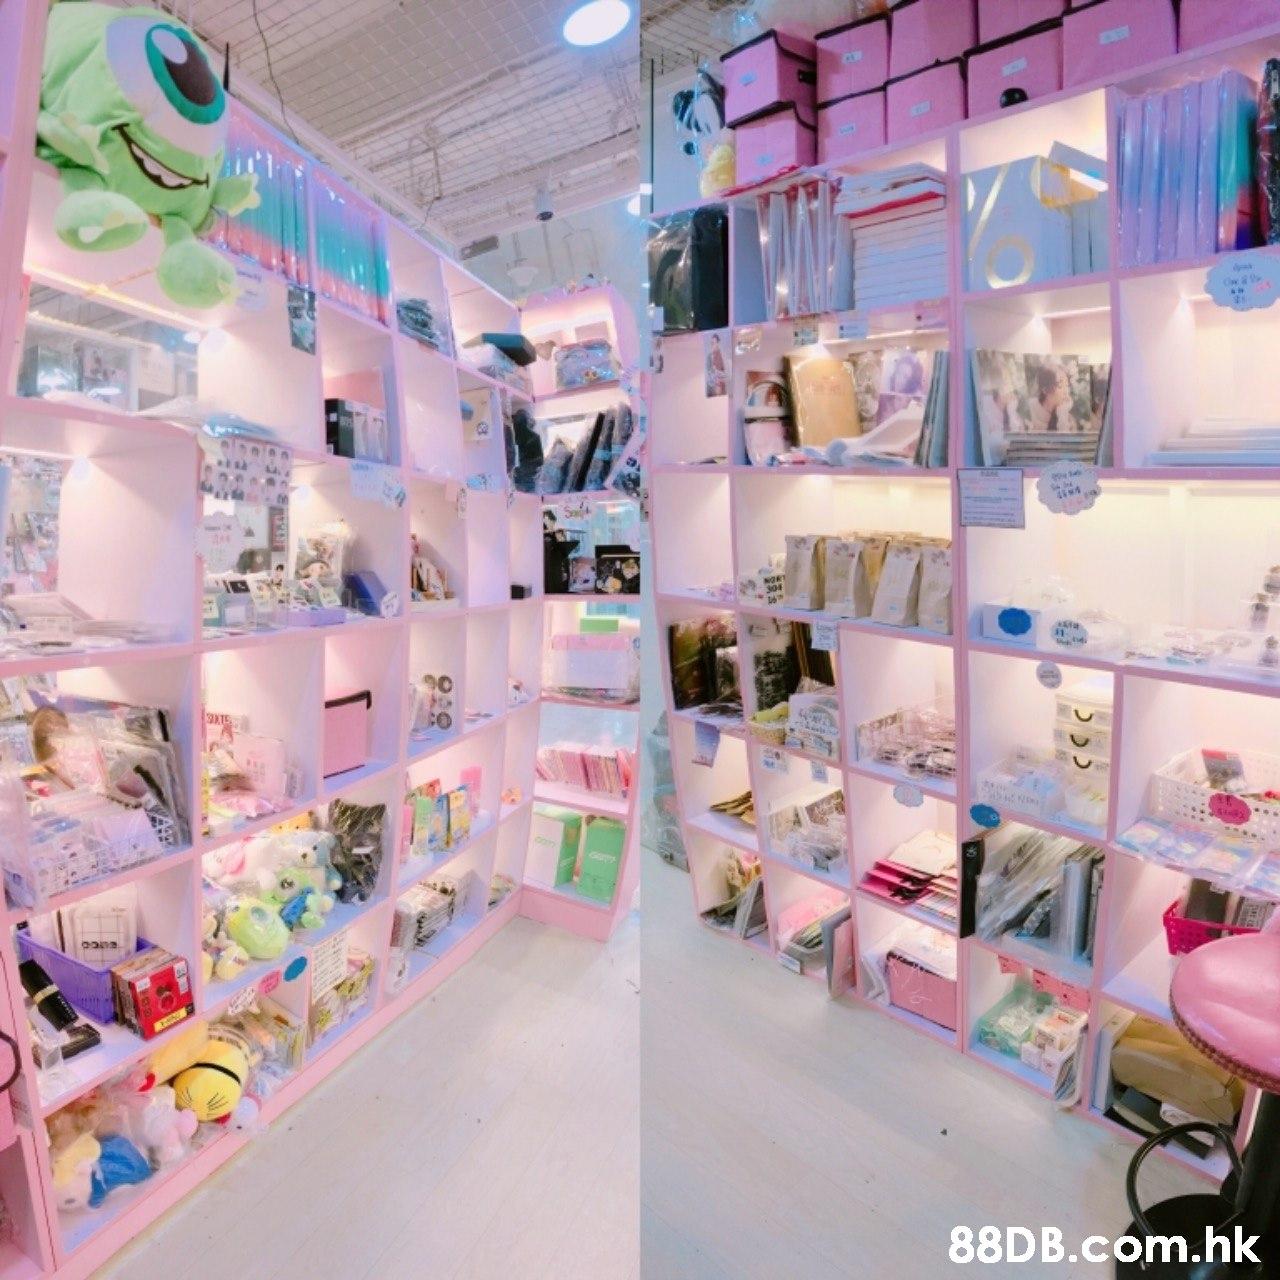 8DB.com.hk 8  Product,Pink,Interior design,Design,Building